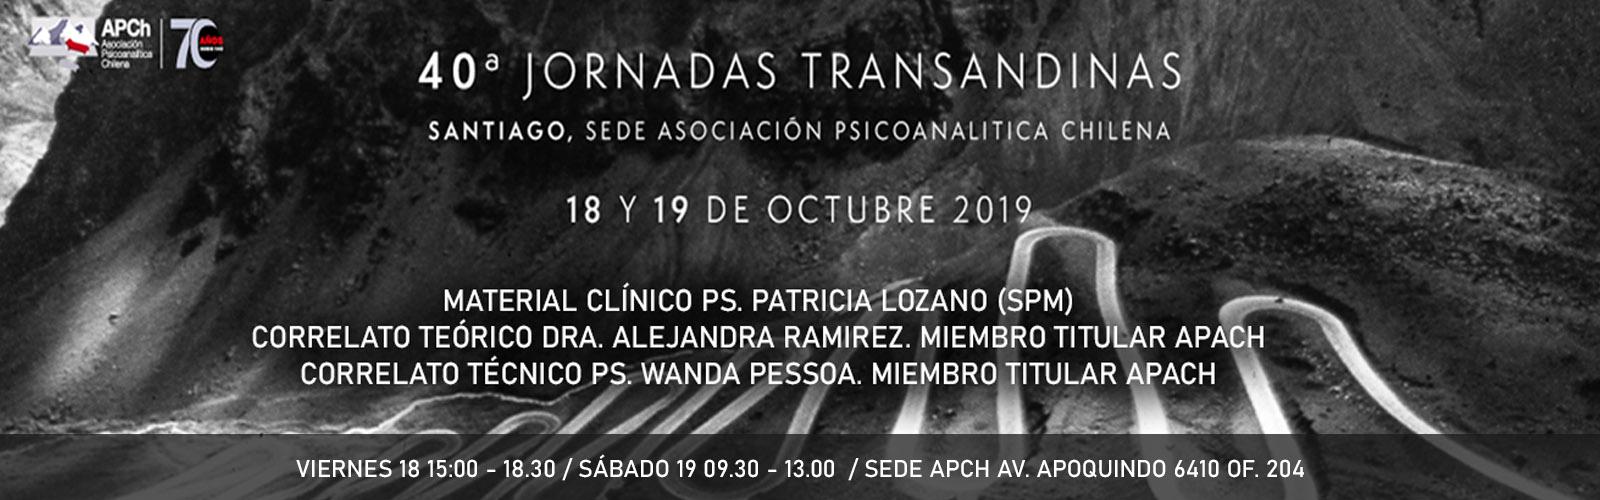 40º Jornadas Trasandinas APACH